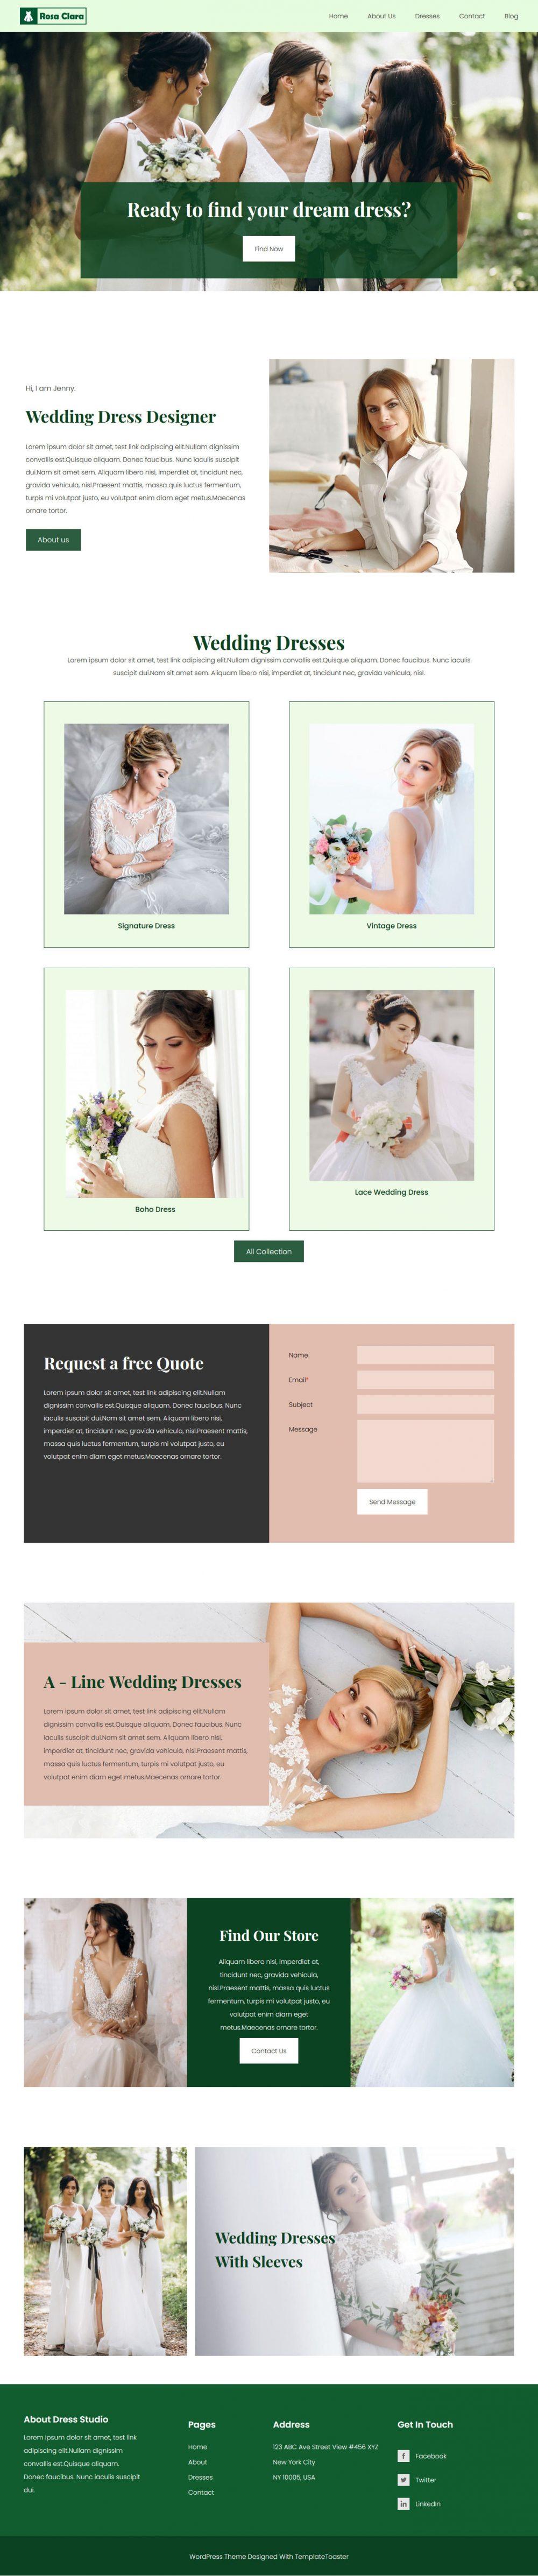 rosa clara wedding dress designer drupal theme